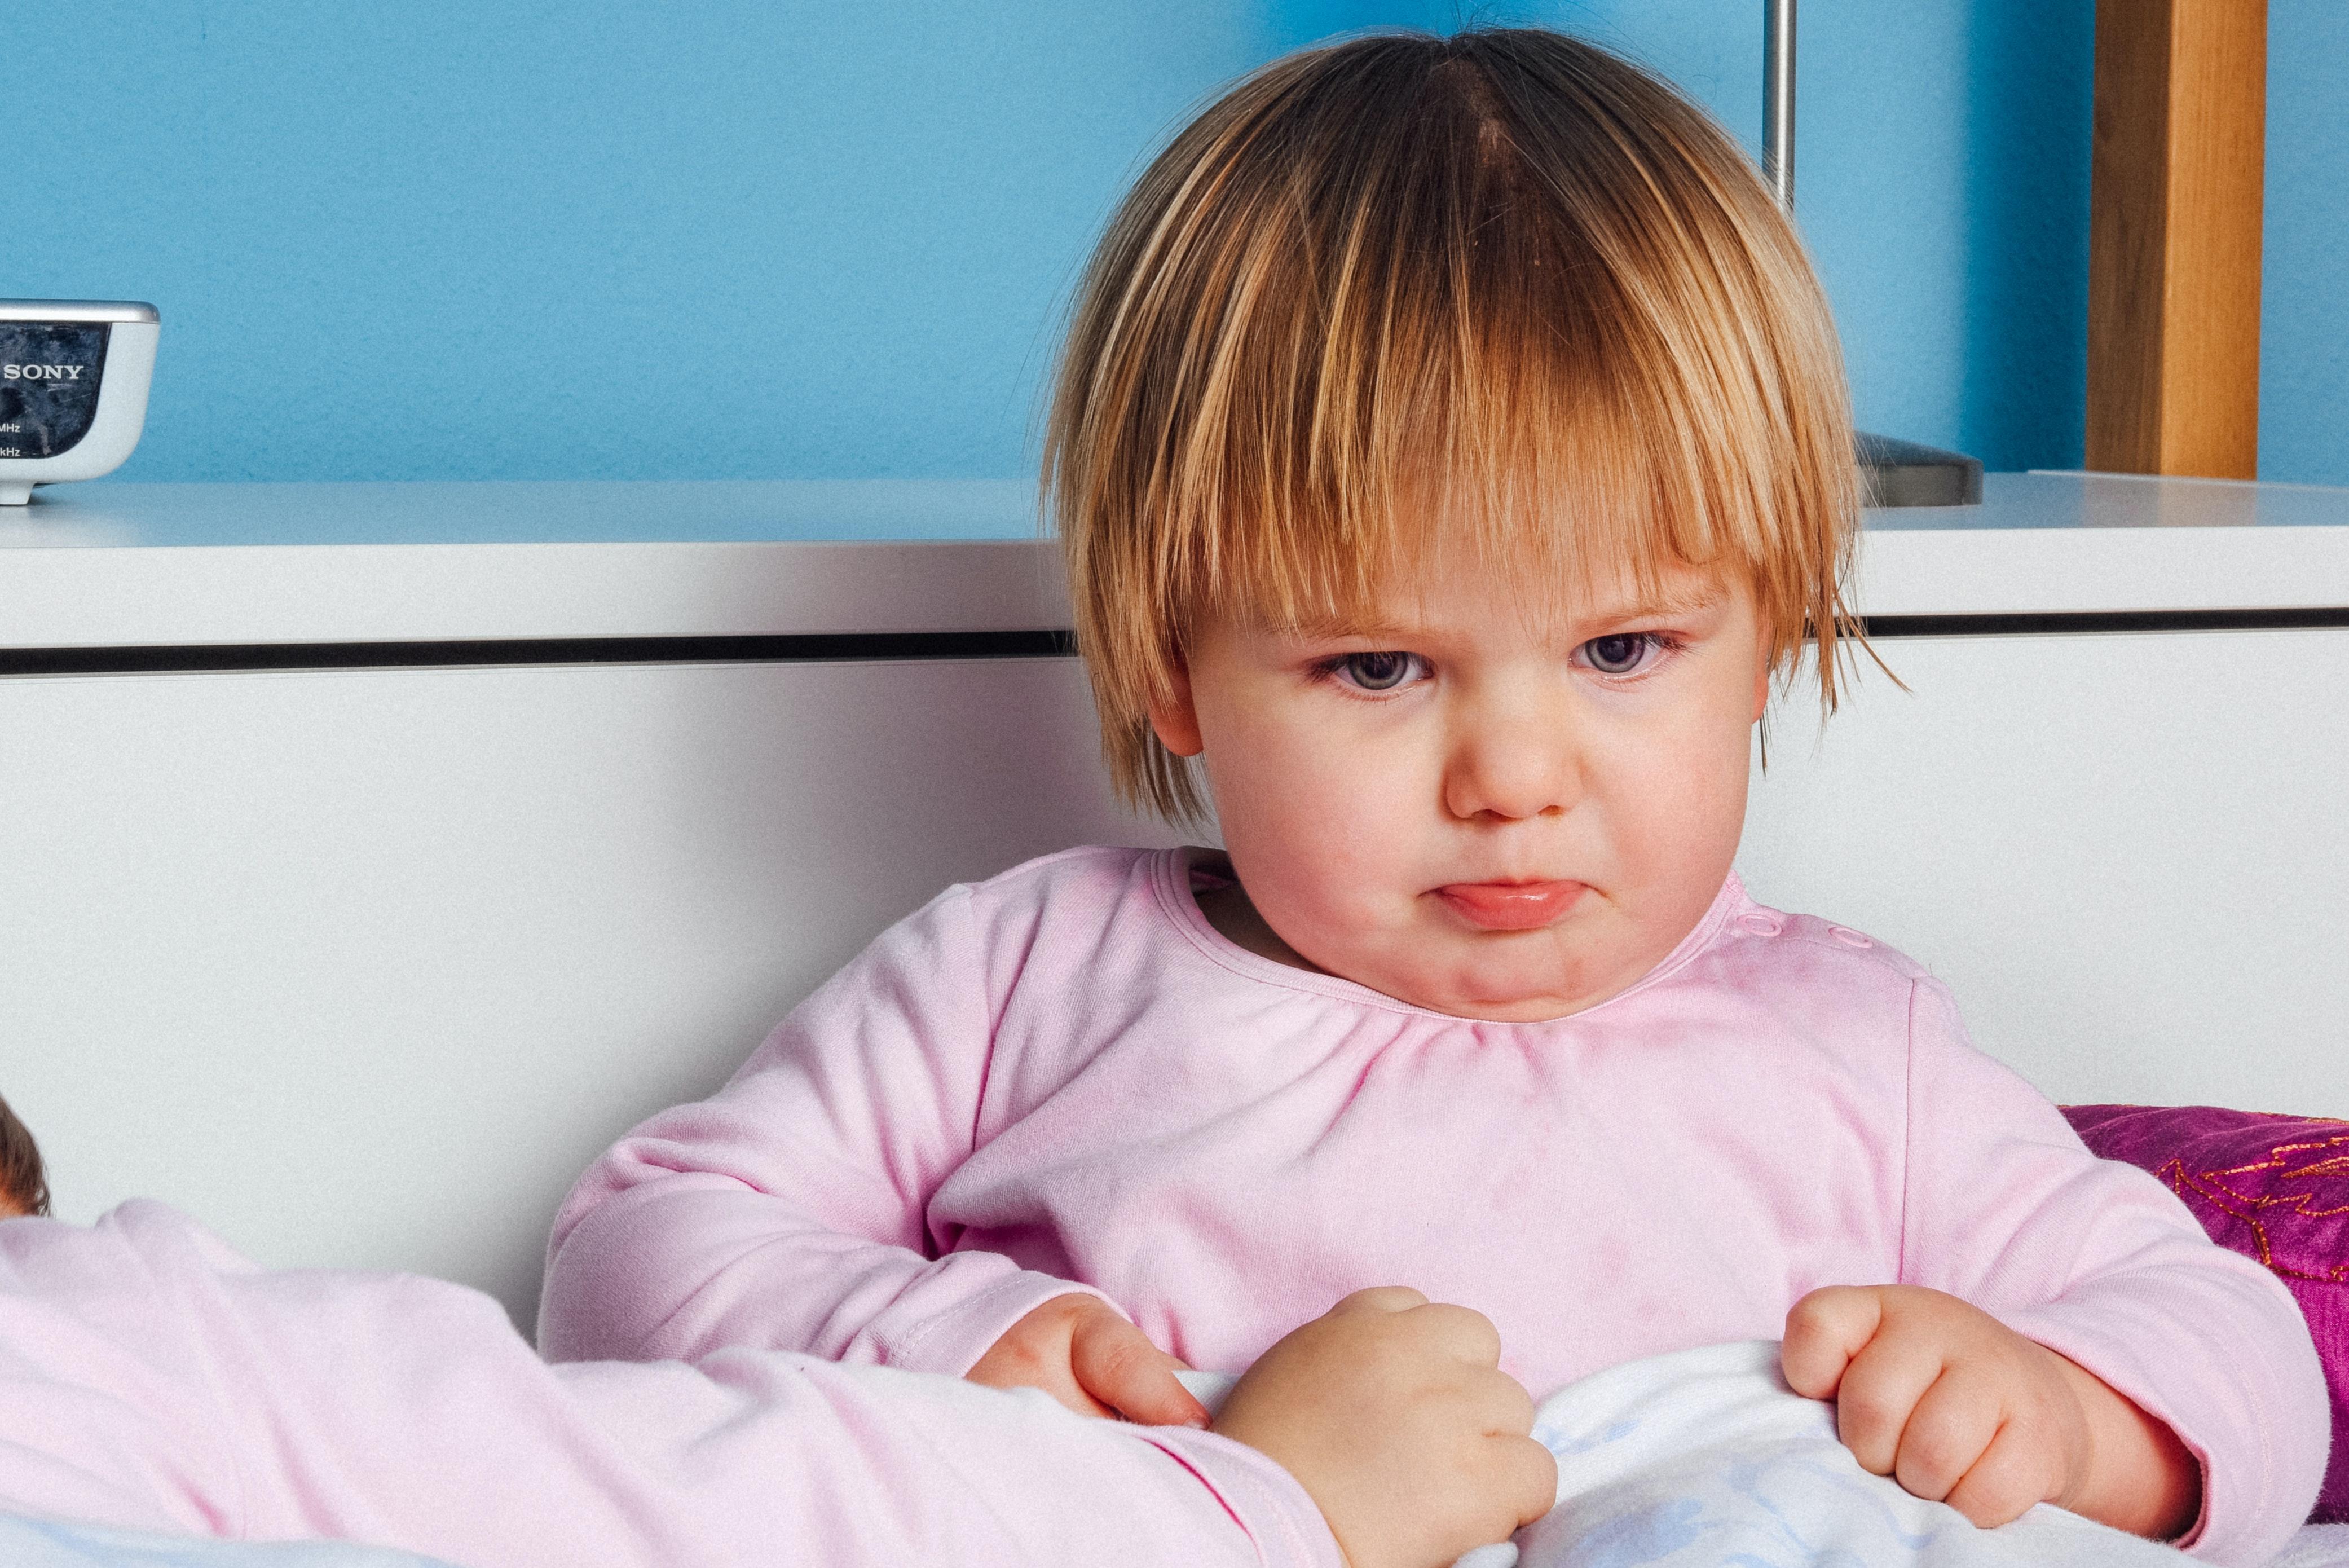 Free stock photo of baby child close up